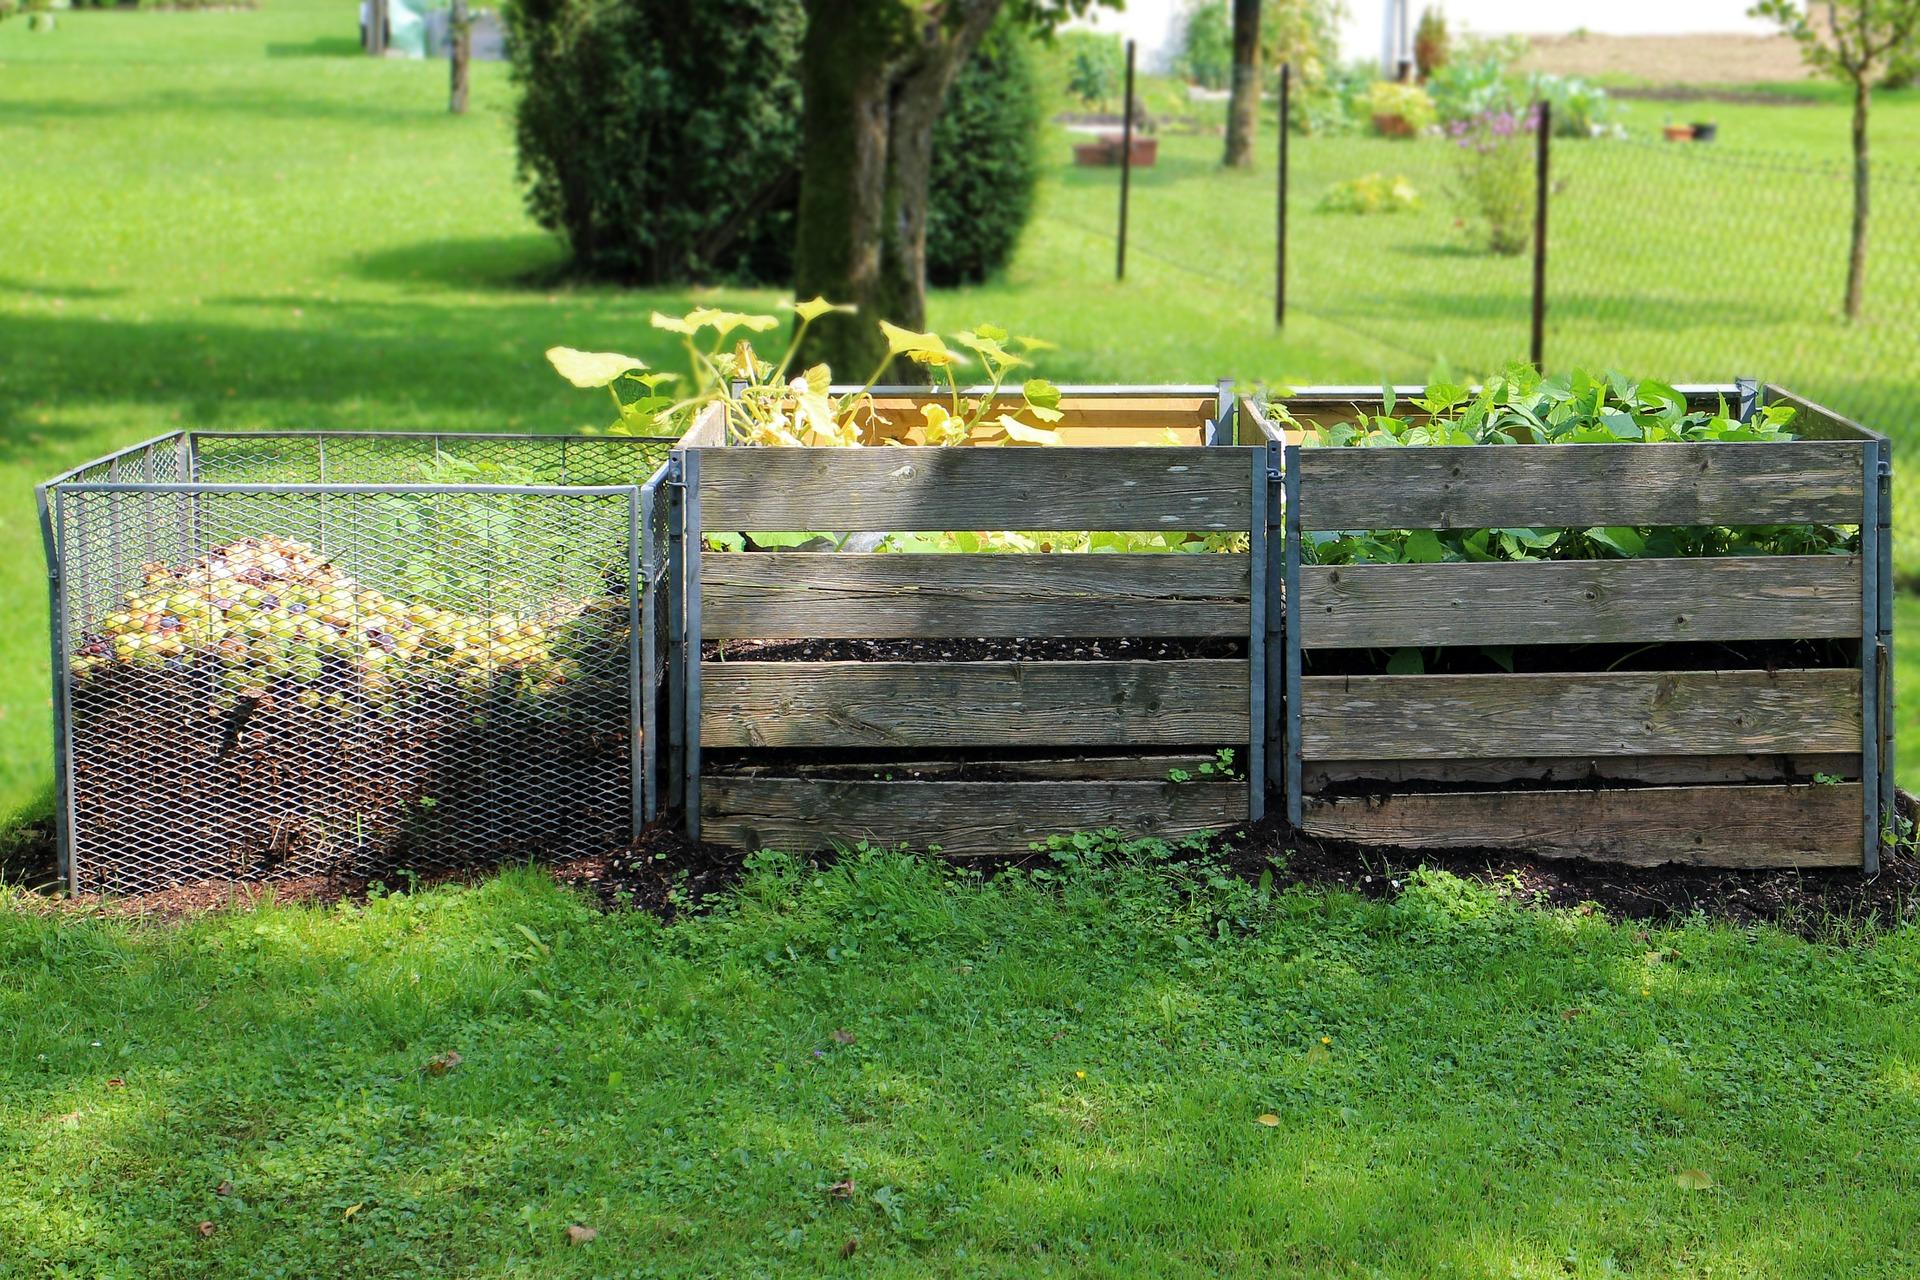 le compost mode d emploi jardiner autrement. Black Bedroom Furniture Sets. Home Design Ideas